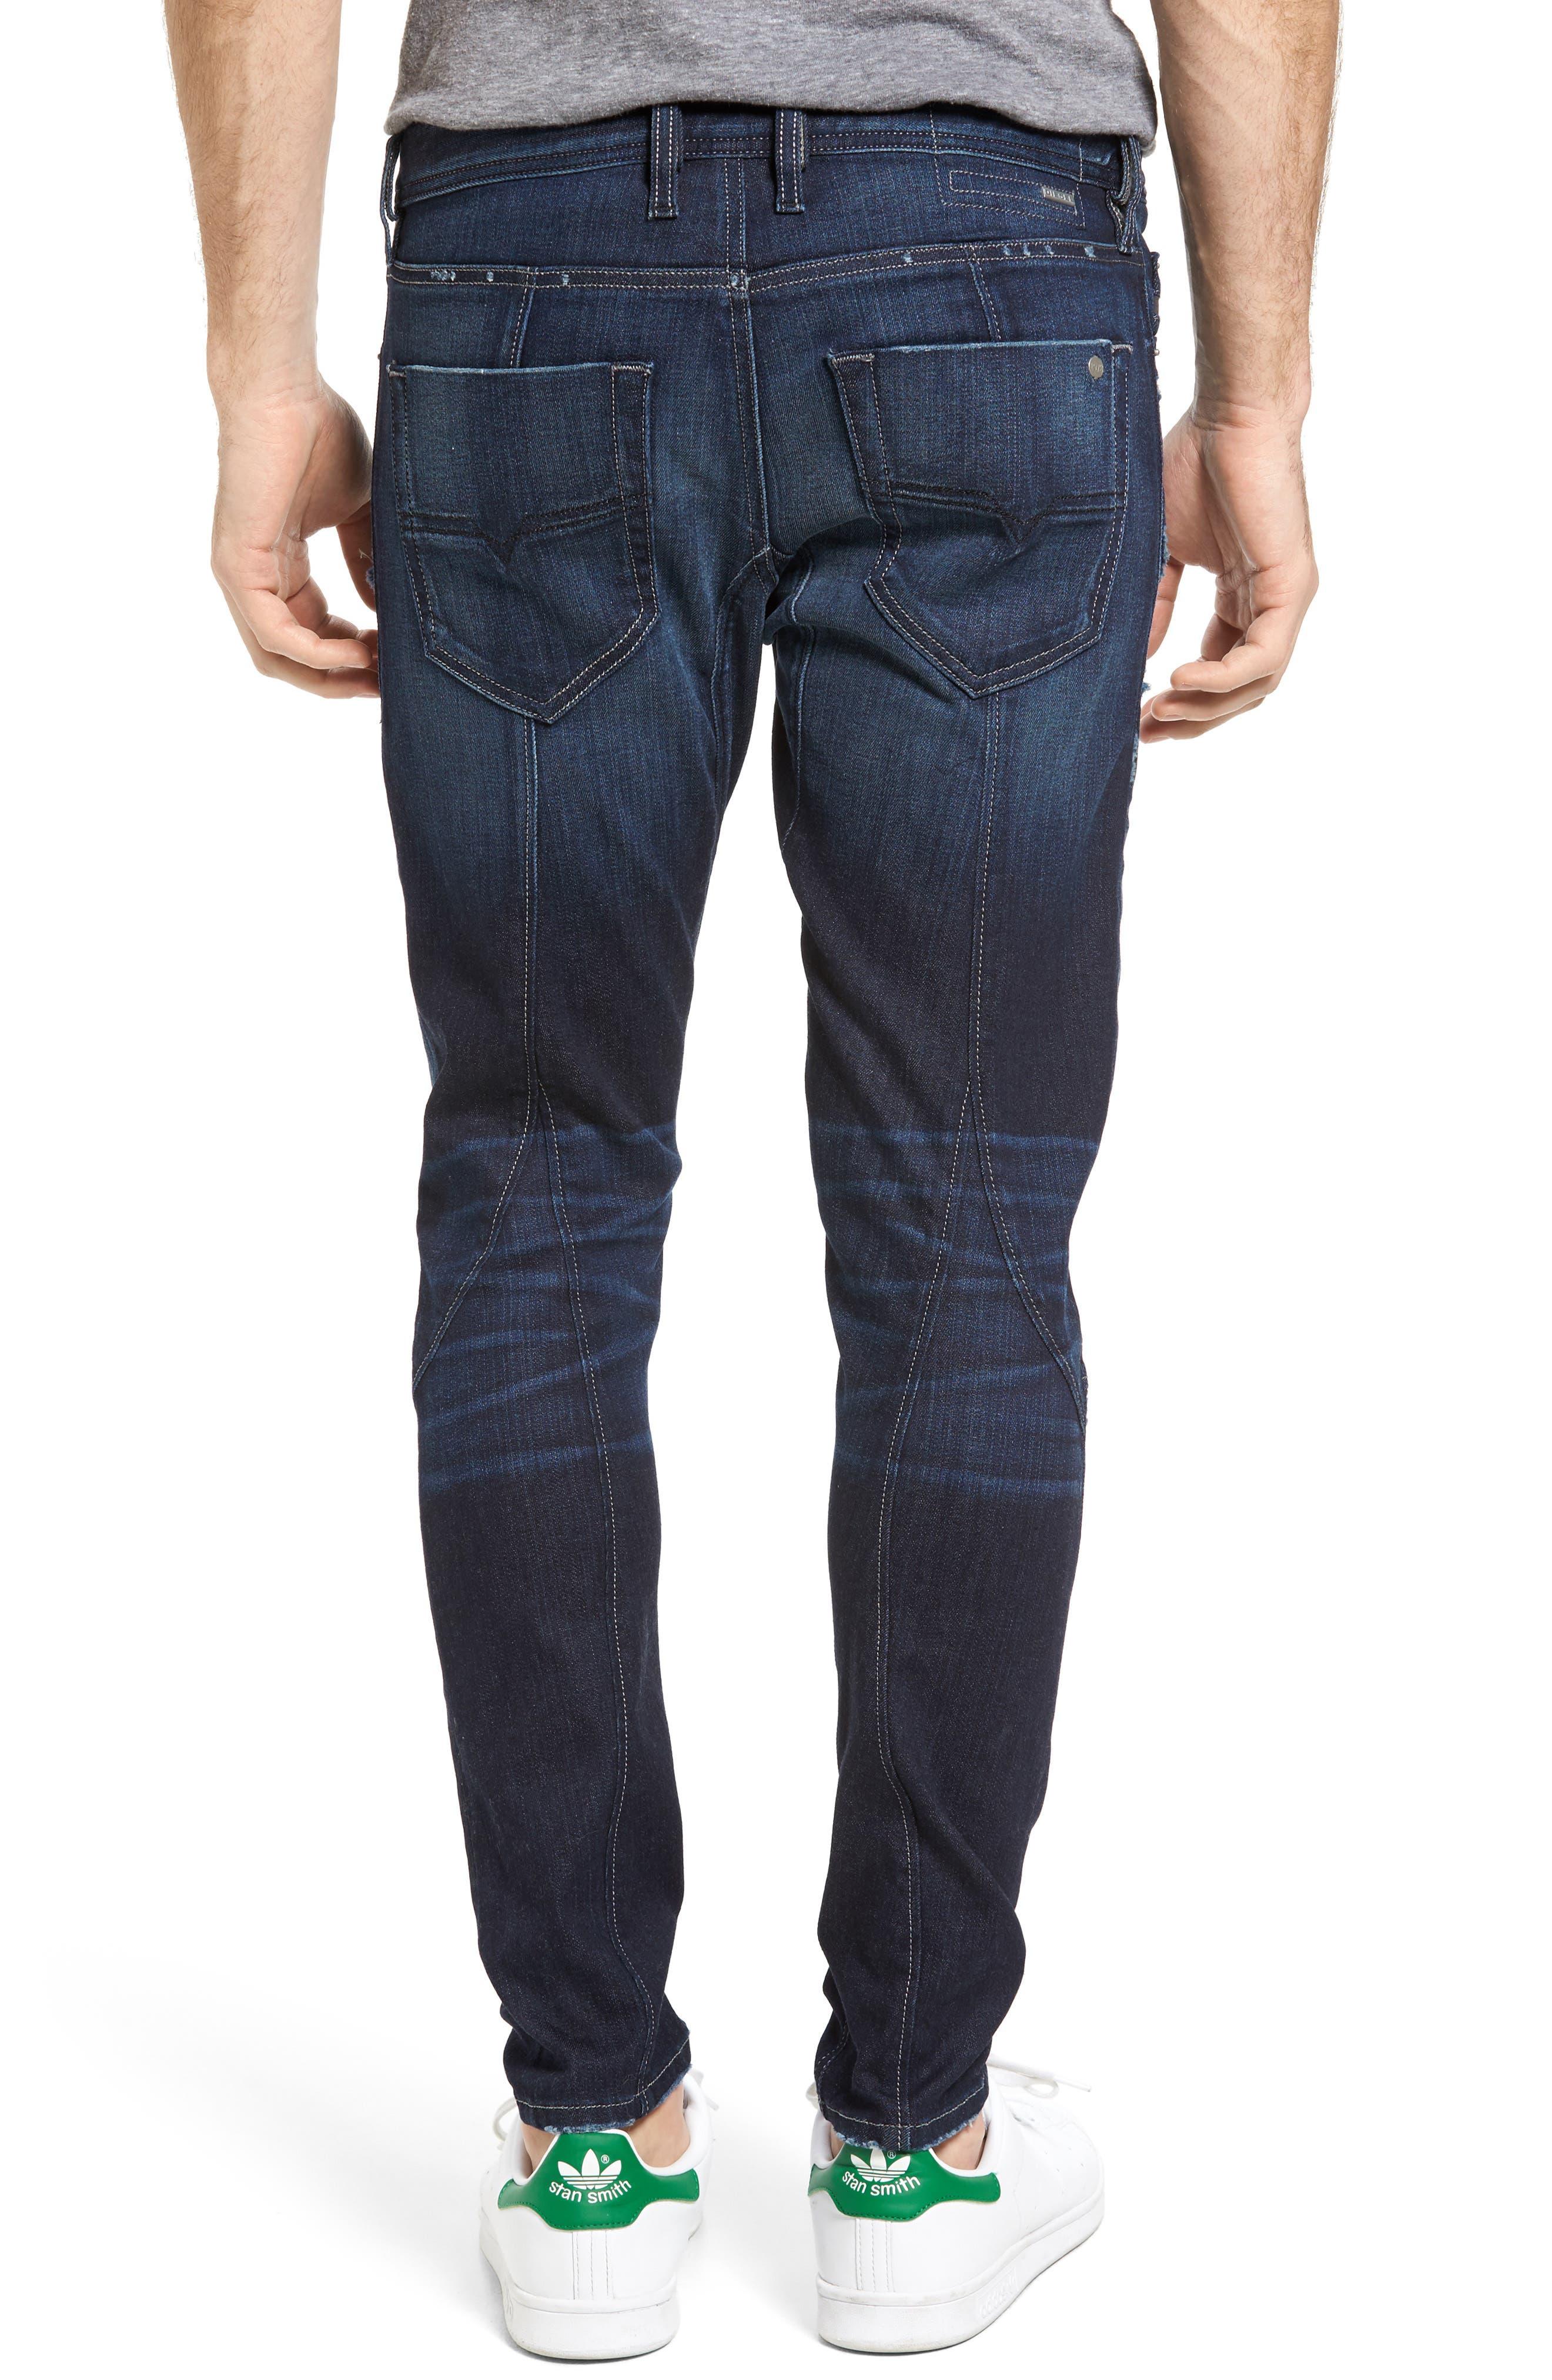 T-Ride Skinny Fit Moto Jeans,                             Alternate thumbnail 2, color,                             400